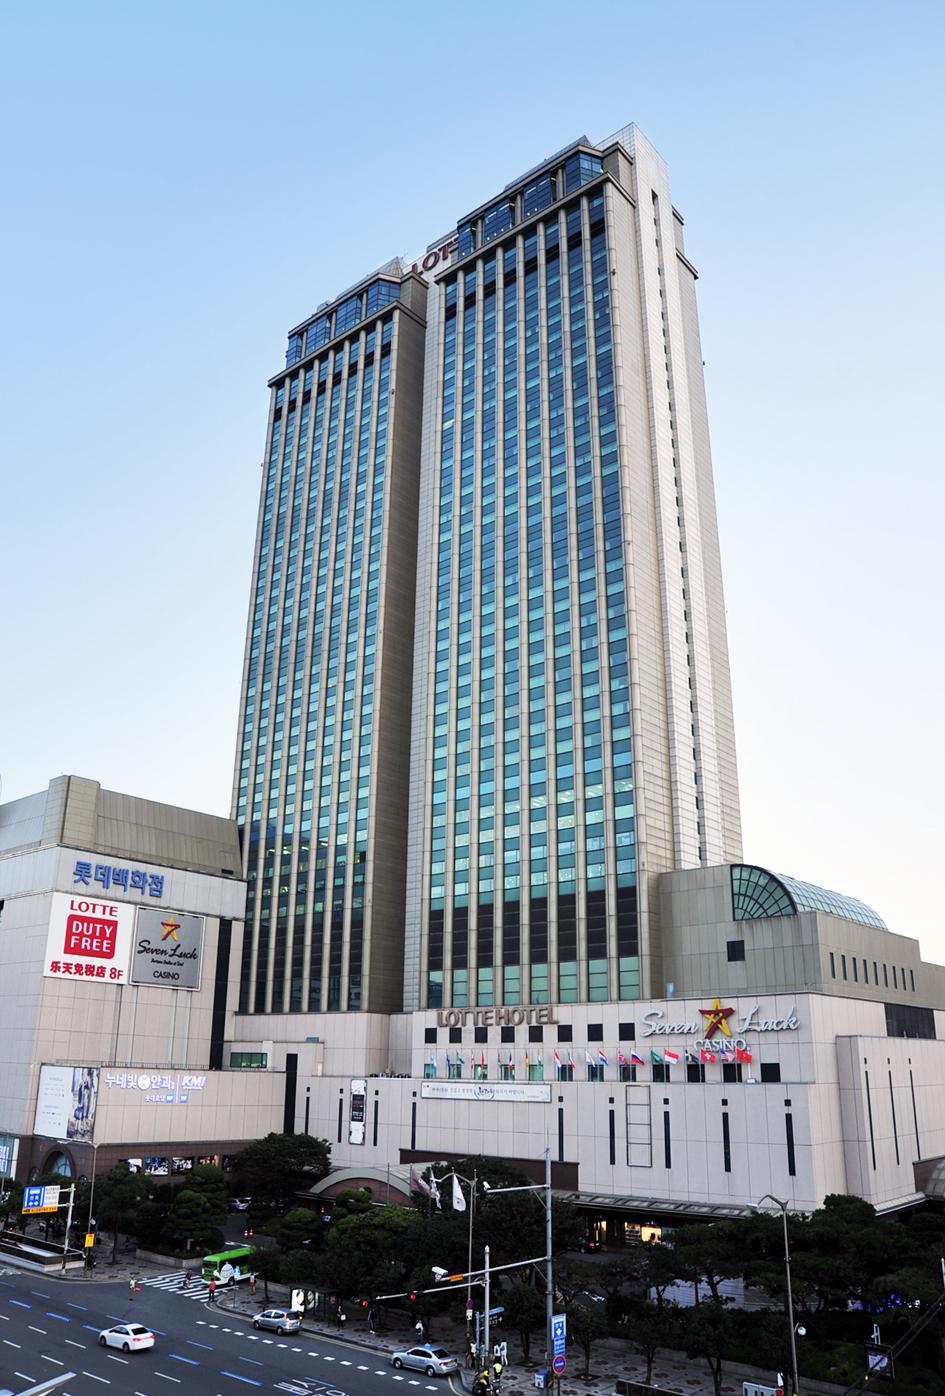 Lotte Hotel Busan representative image